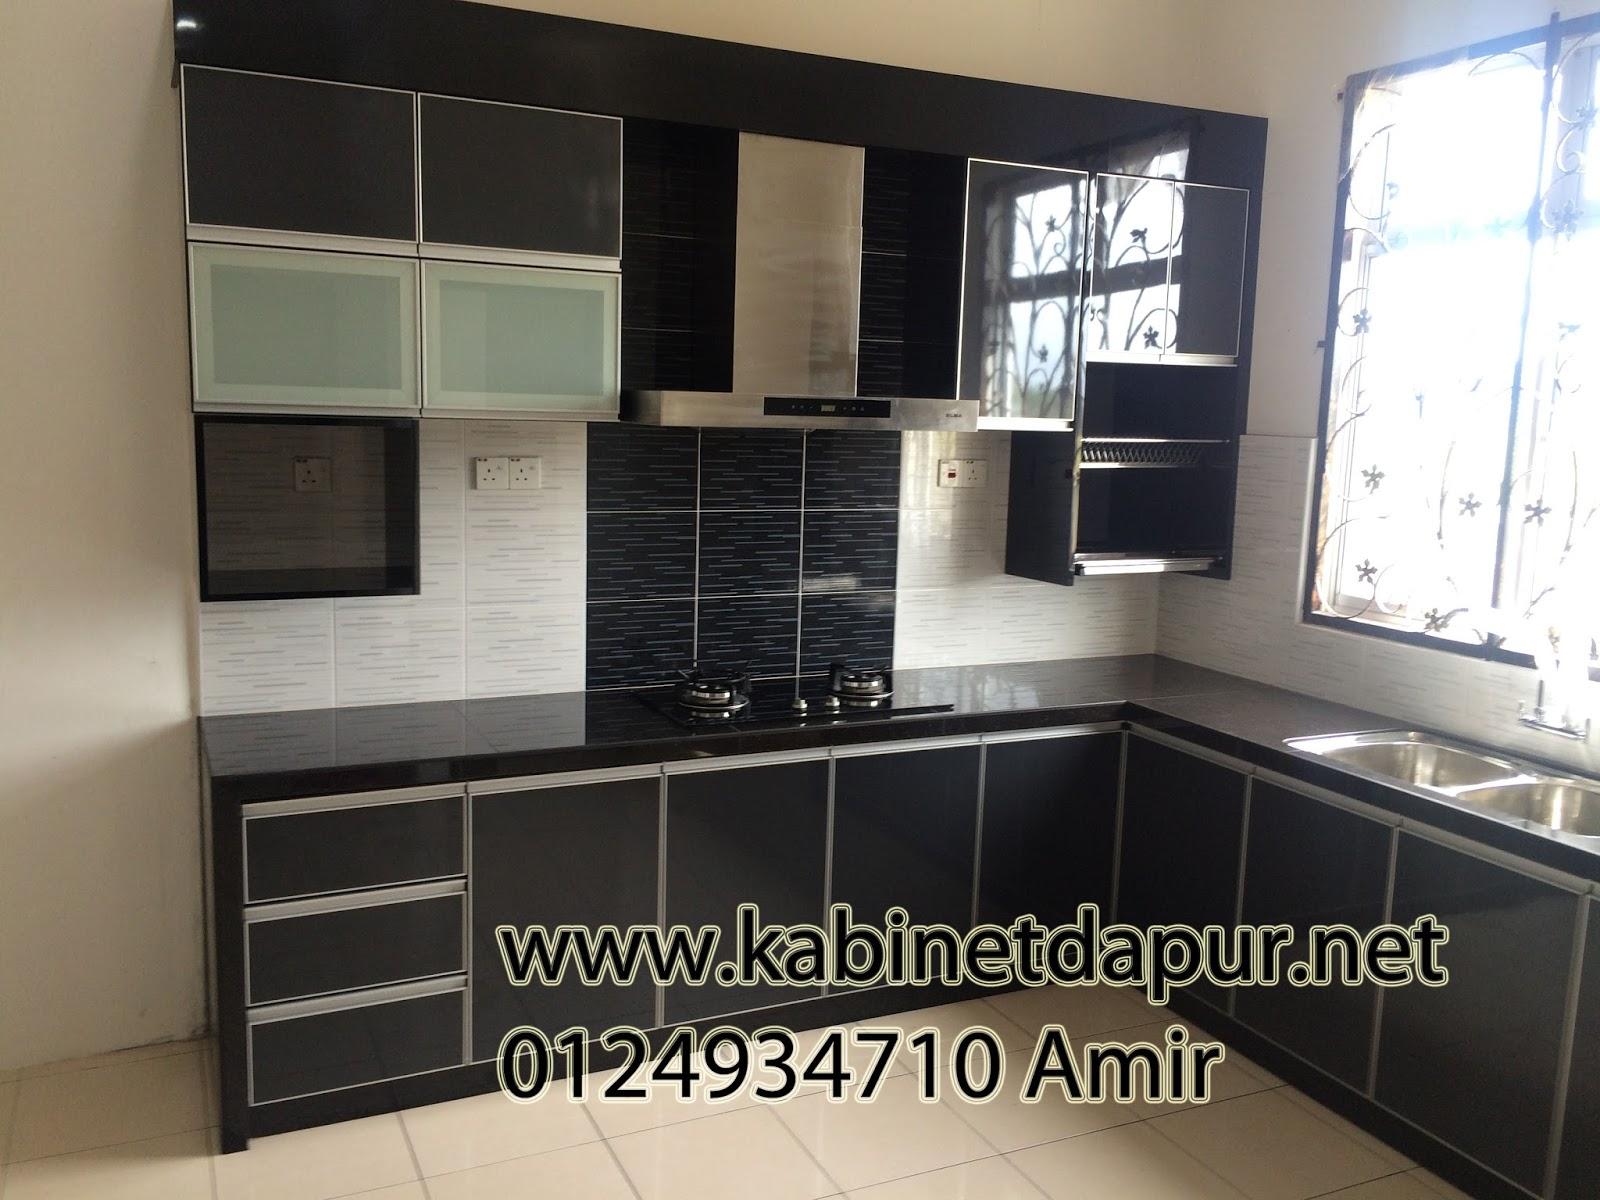 Projek Kabinet Dapur Di Taman Alor Janggus Hubungi 0124934710 En